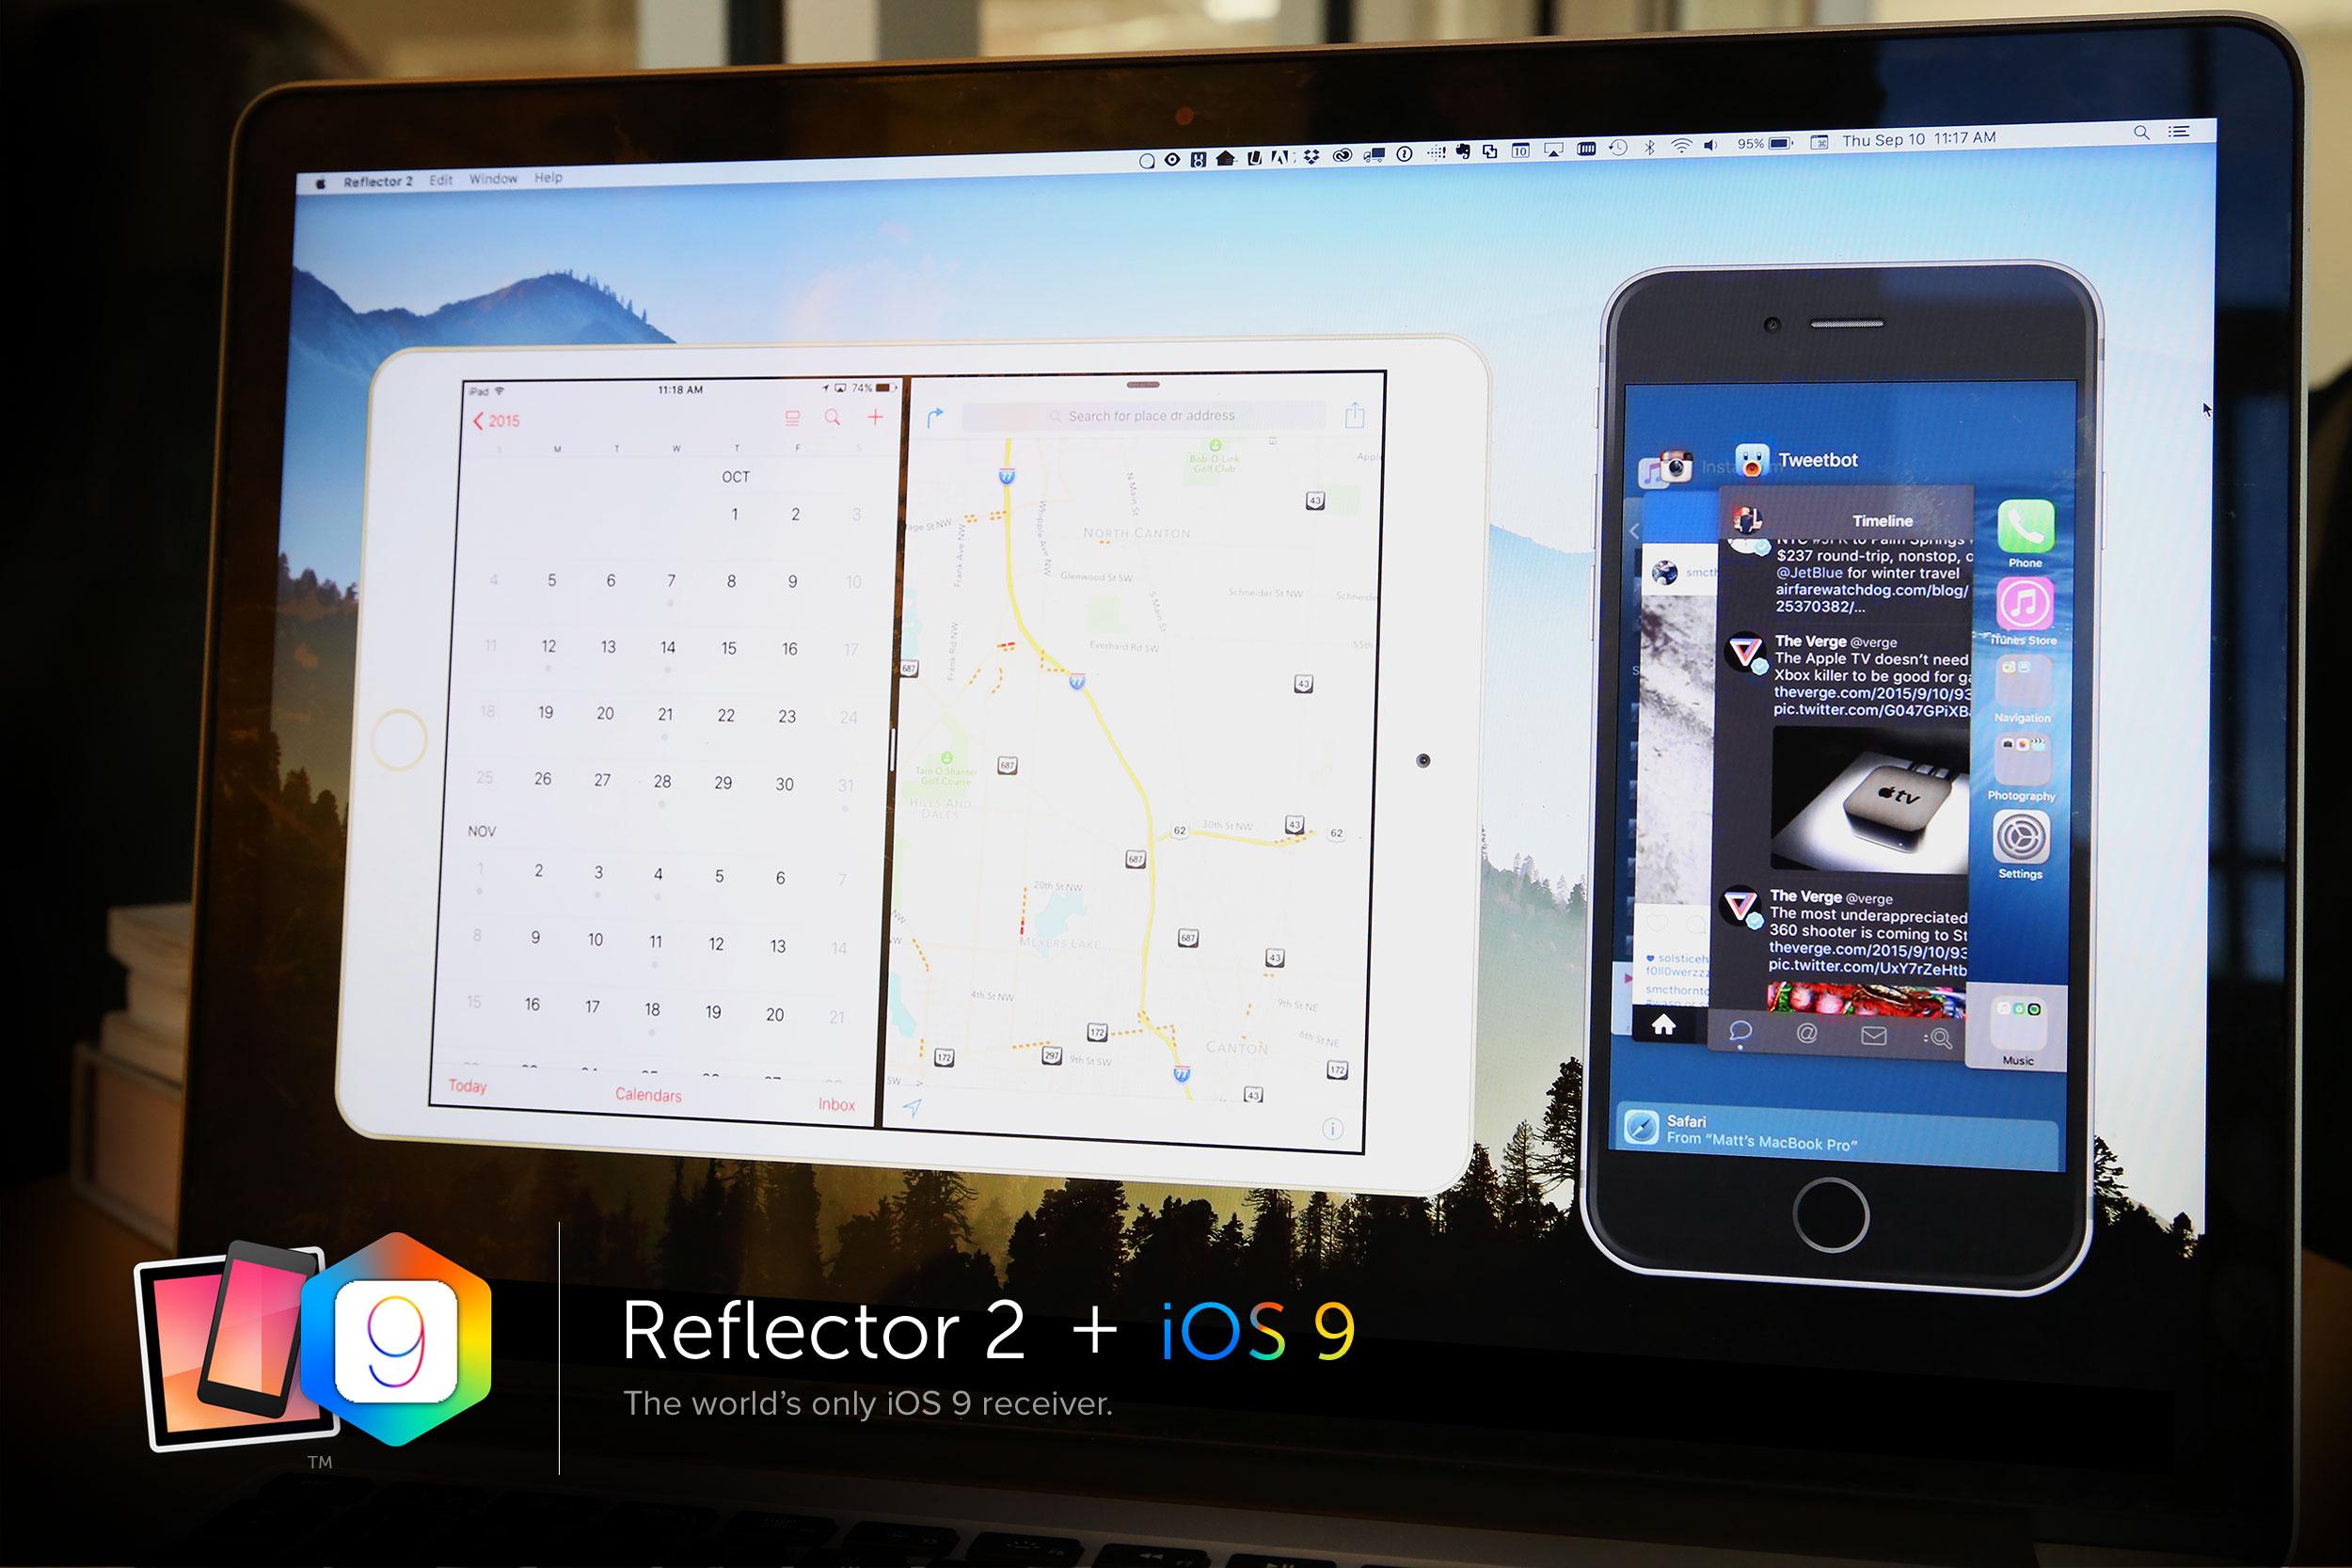 iOS 9 Reflector 2